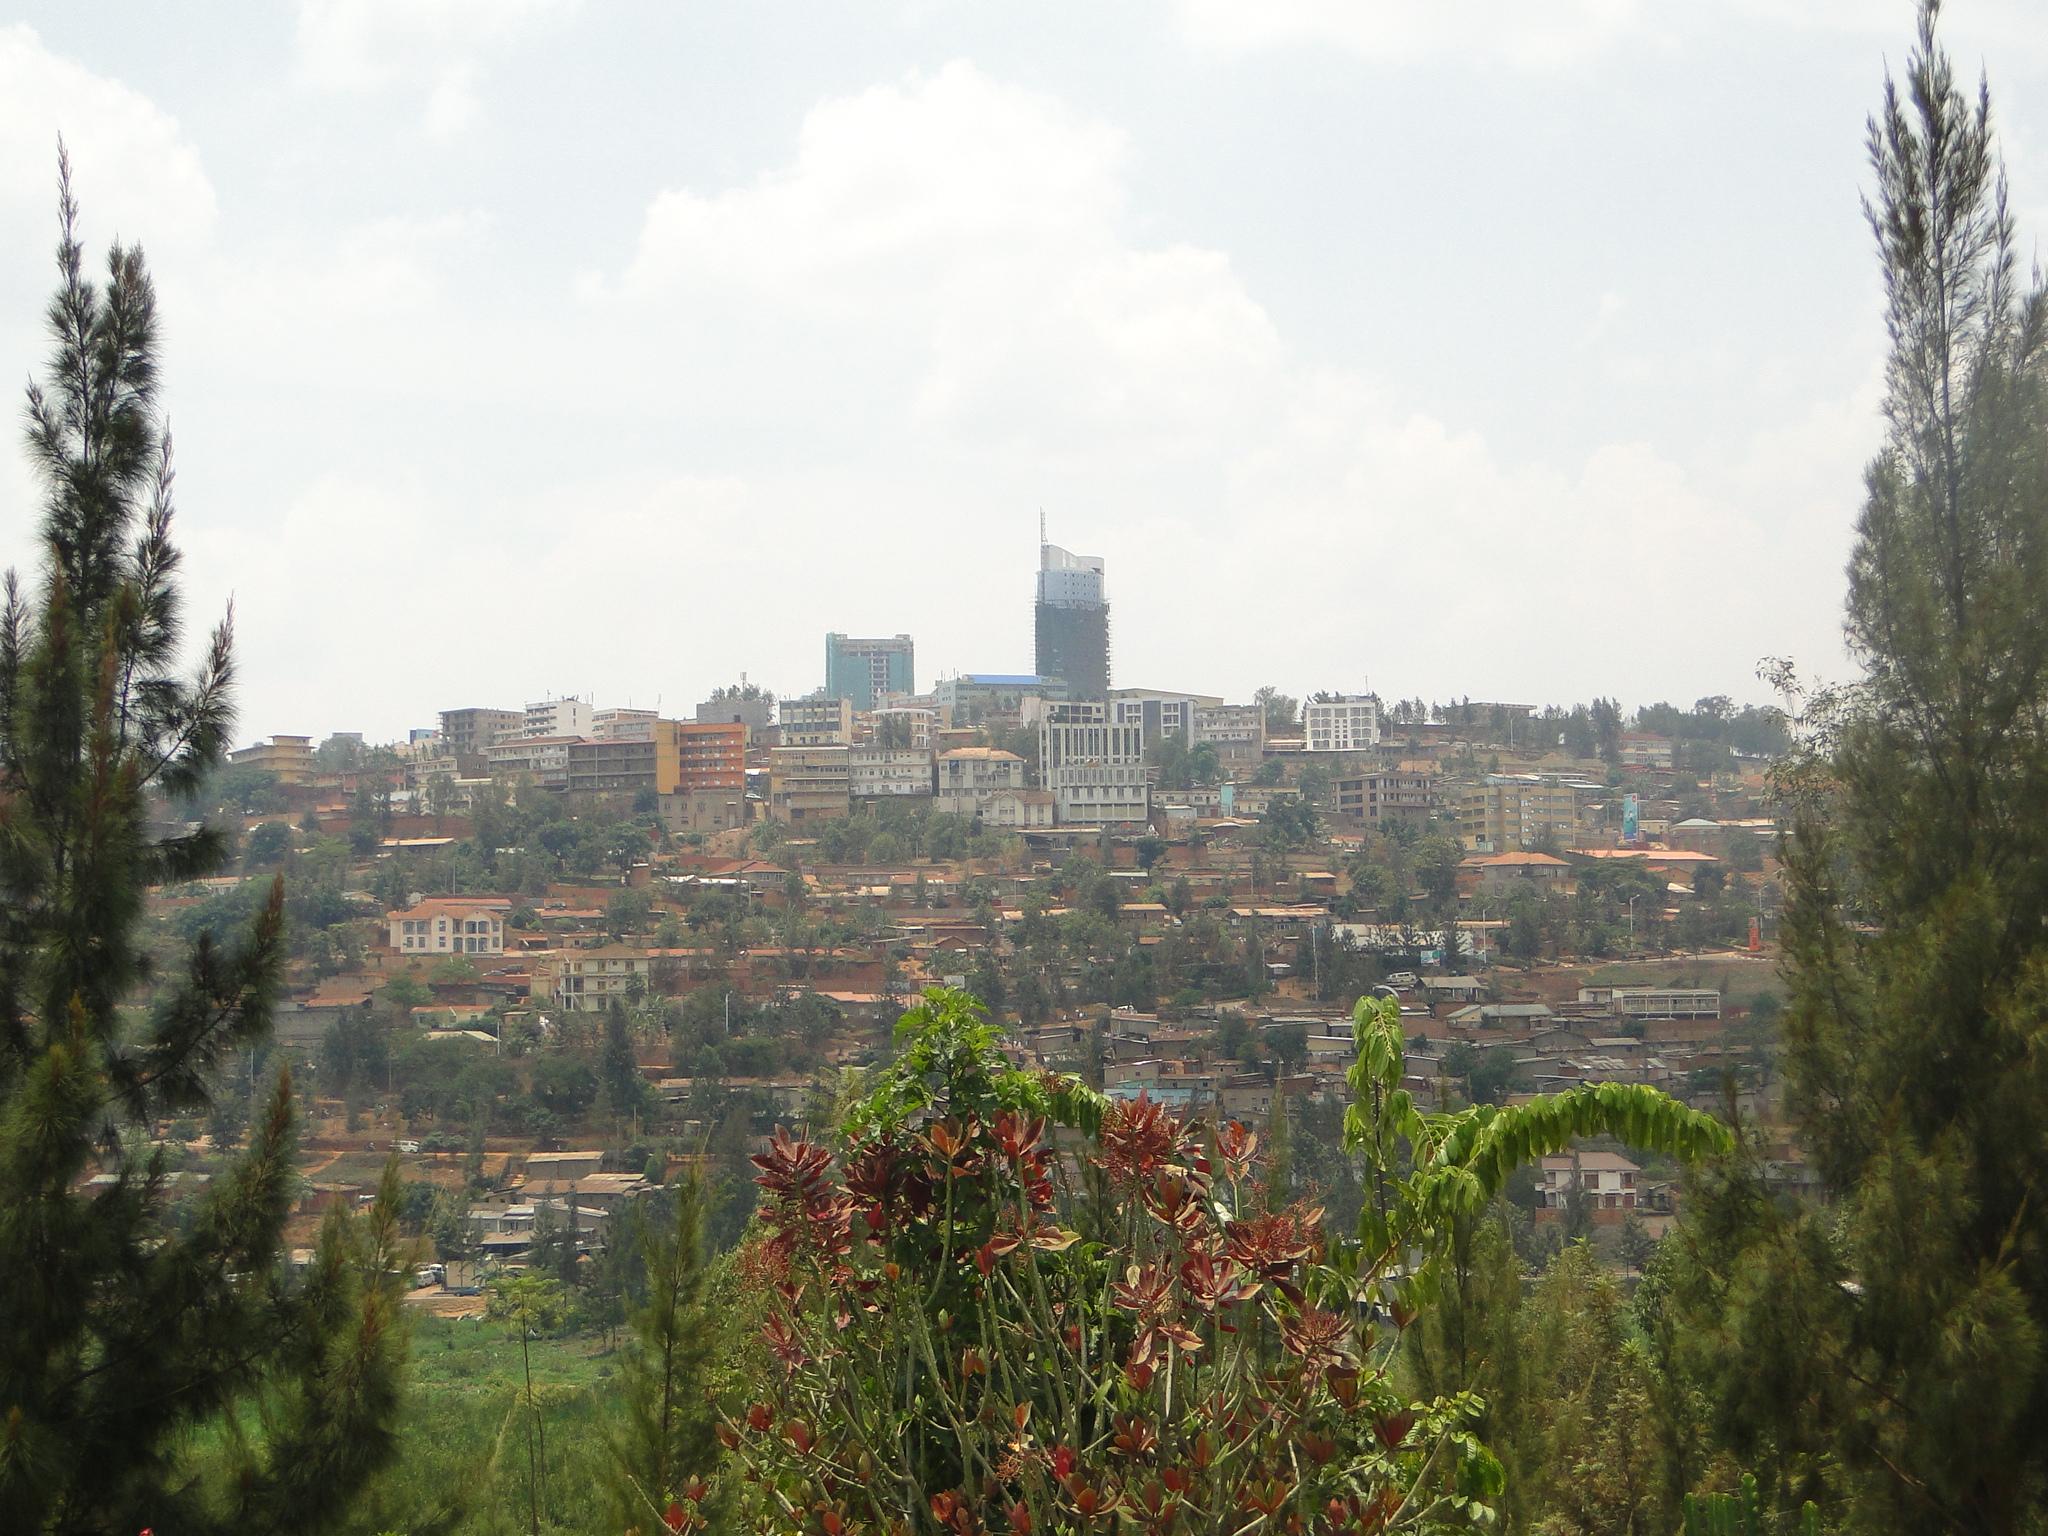 File:Downtown Kigali 2010.JPG - Wikimedia Commons